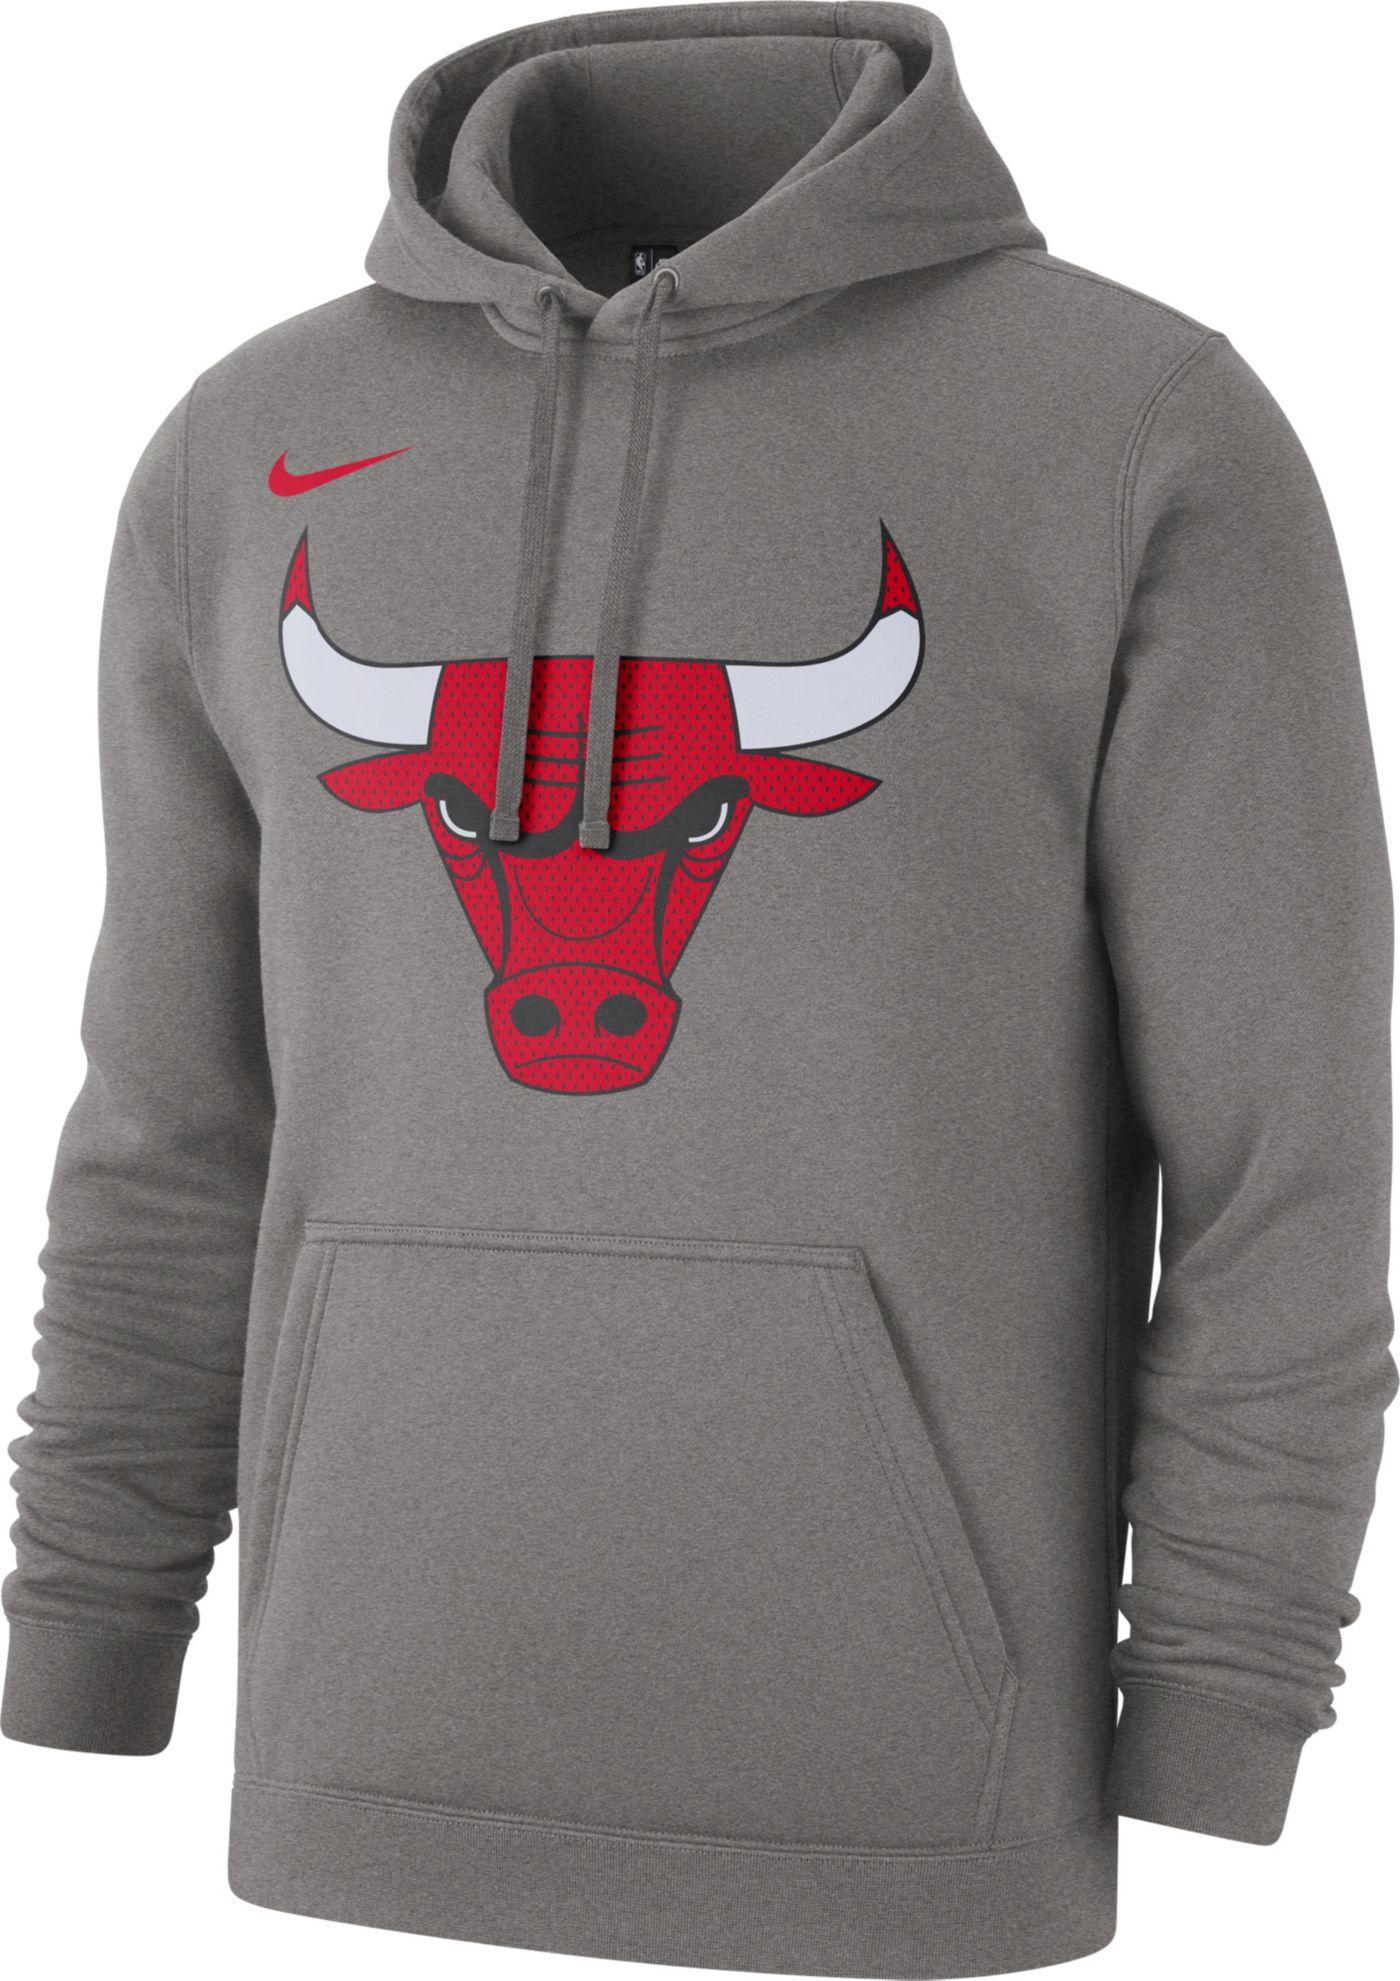 Nike Men's Chicago Bulls Pullover Hoodie